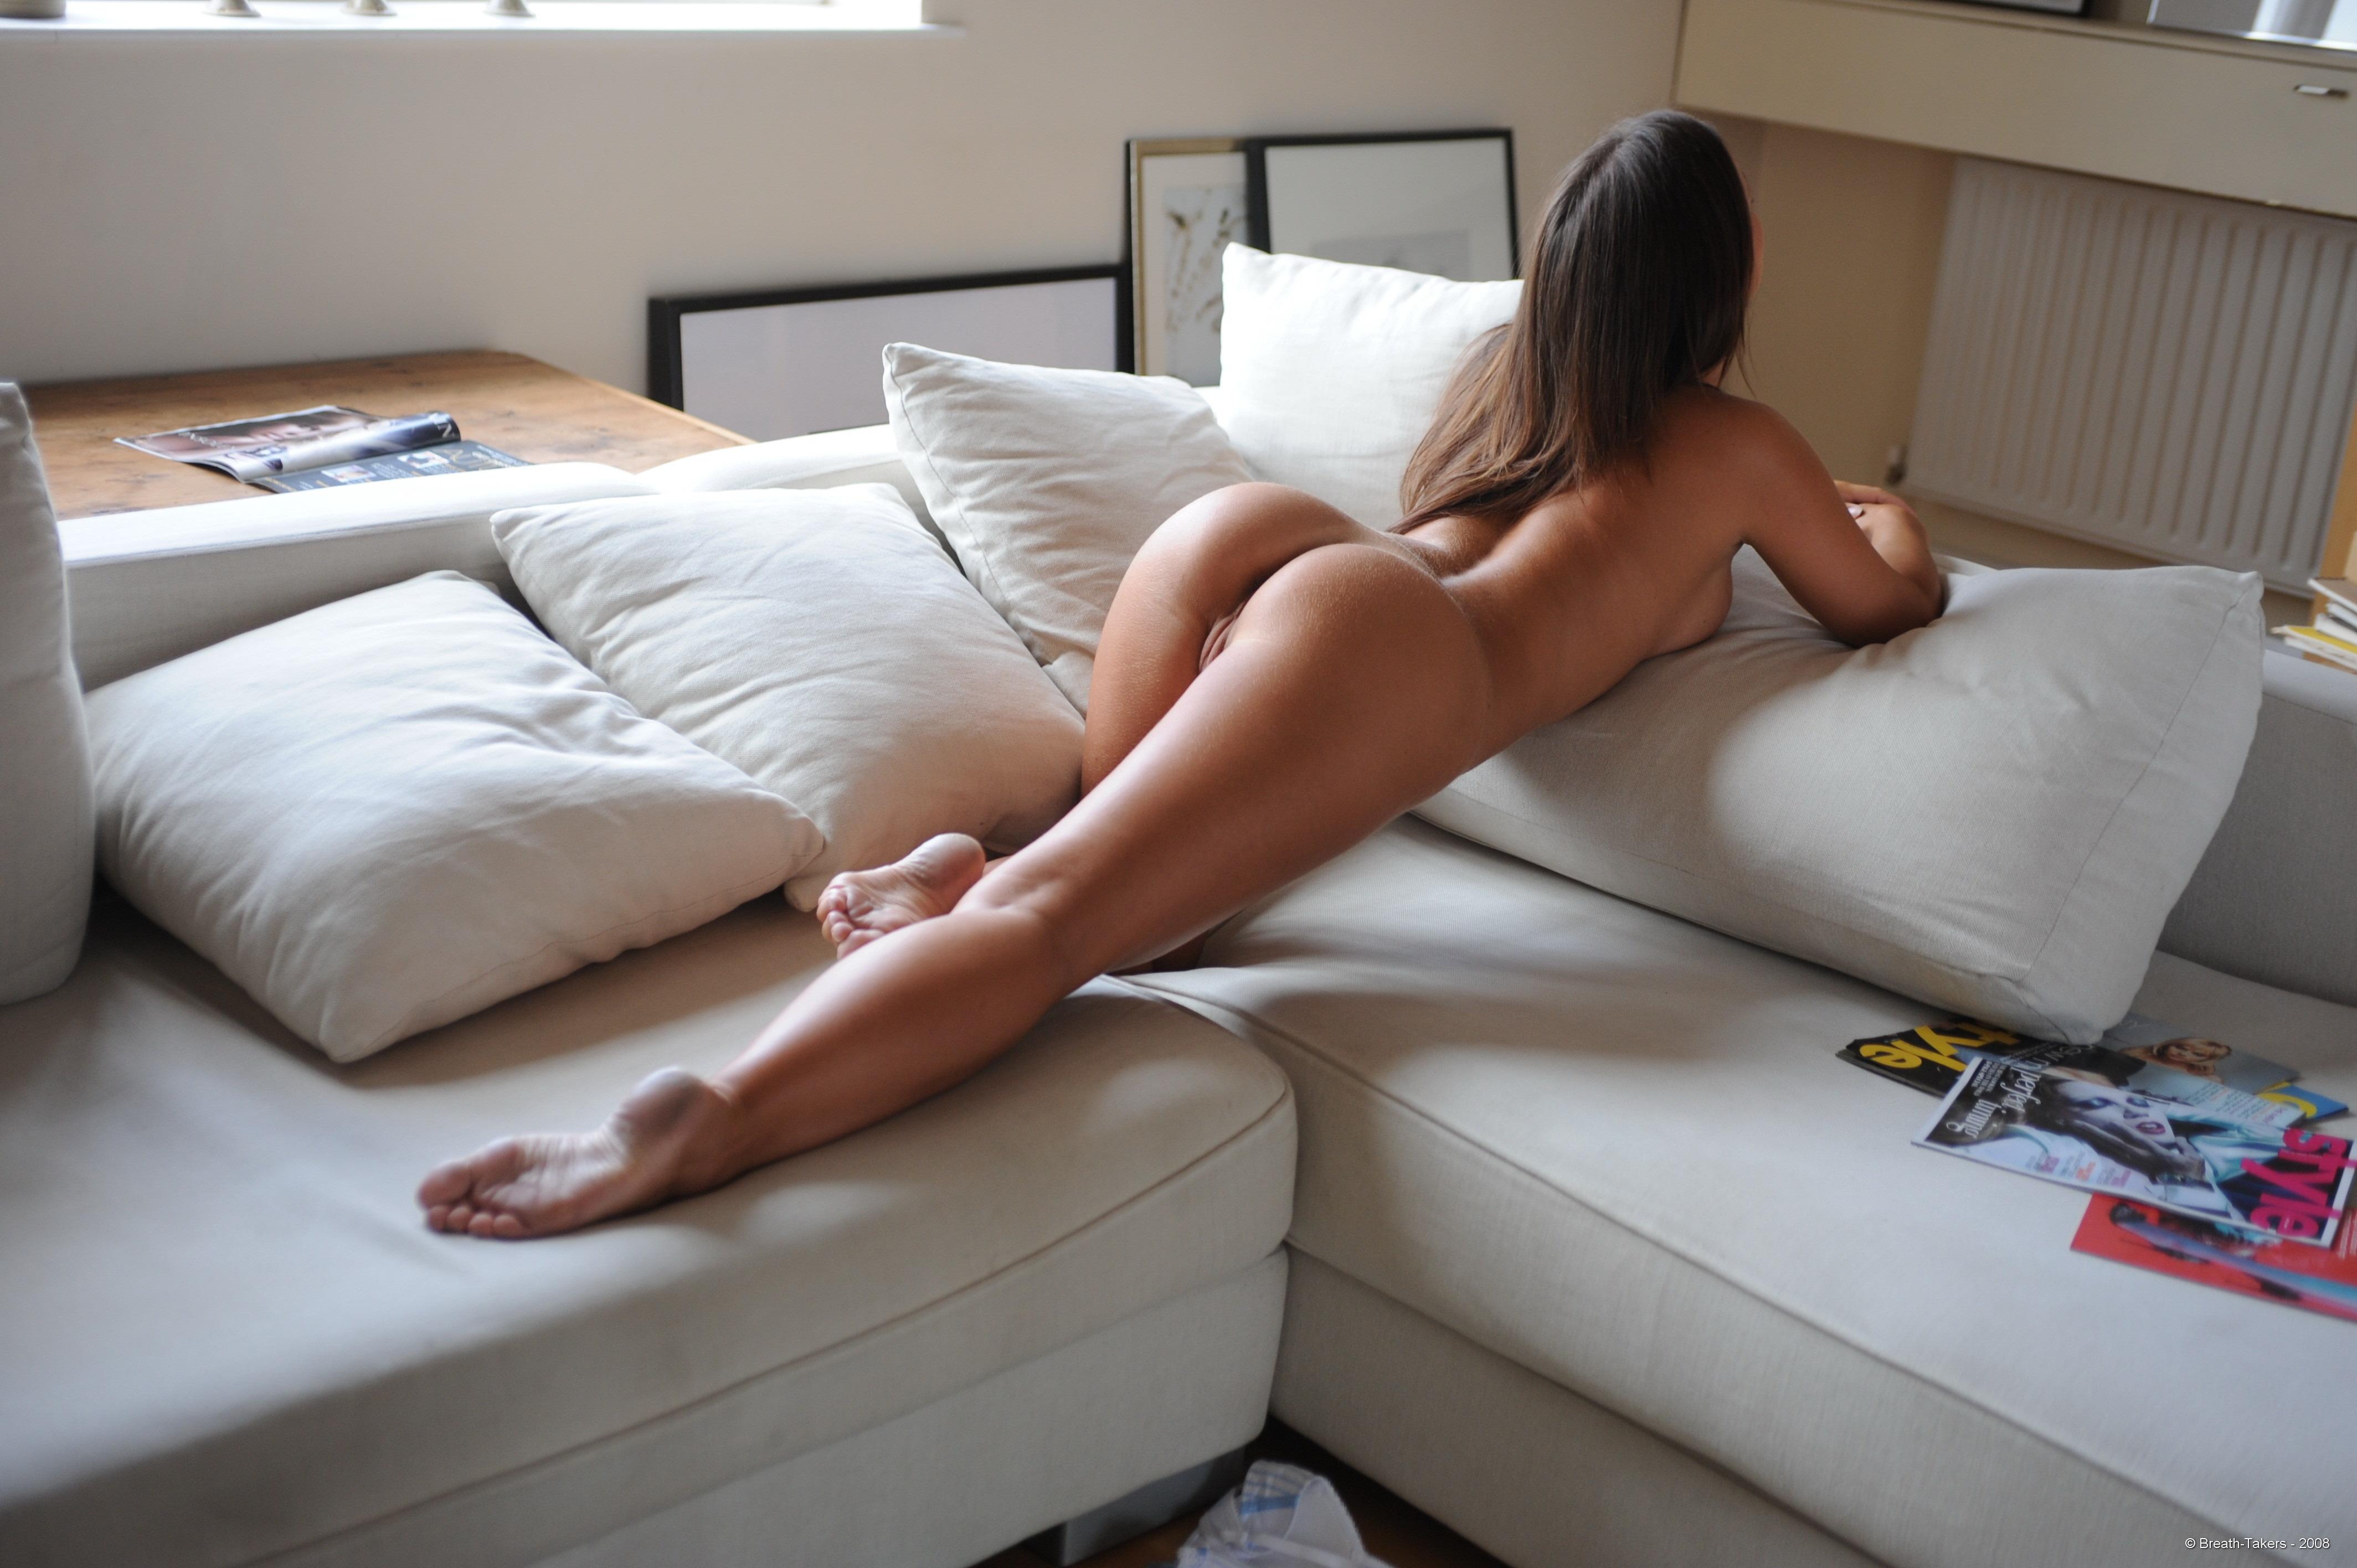 Rate my rack ass legs babe